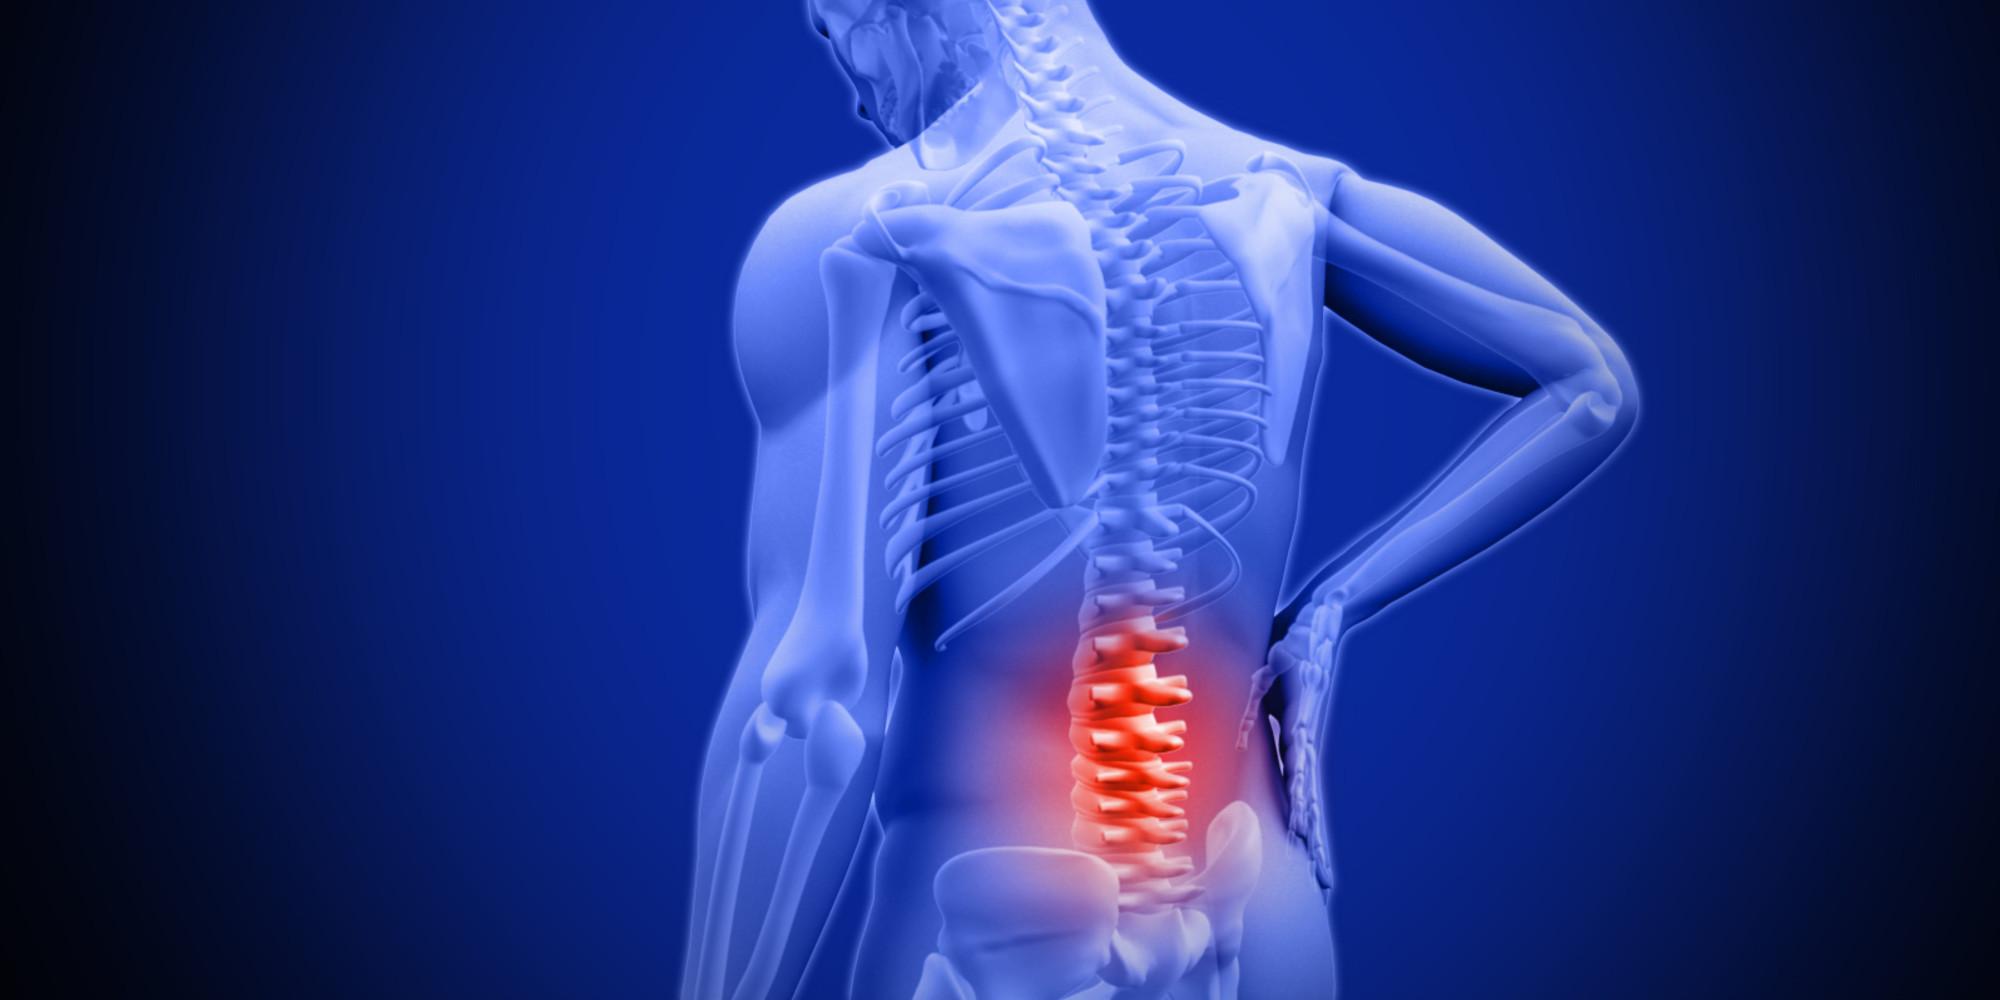 Spine Surgery: